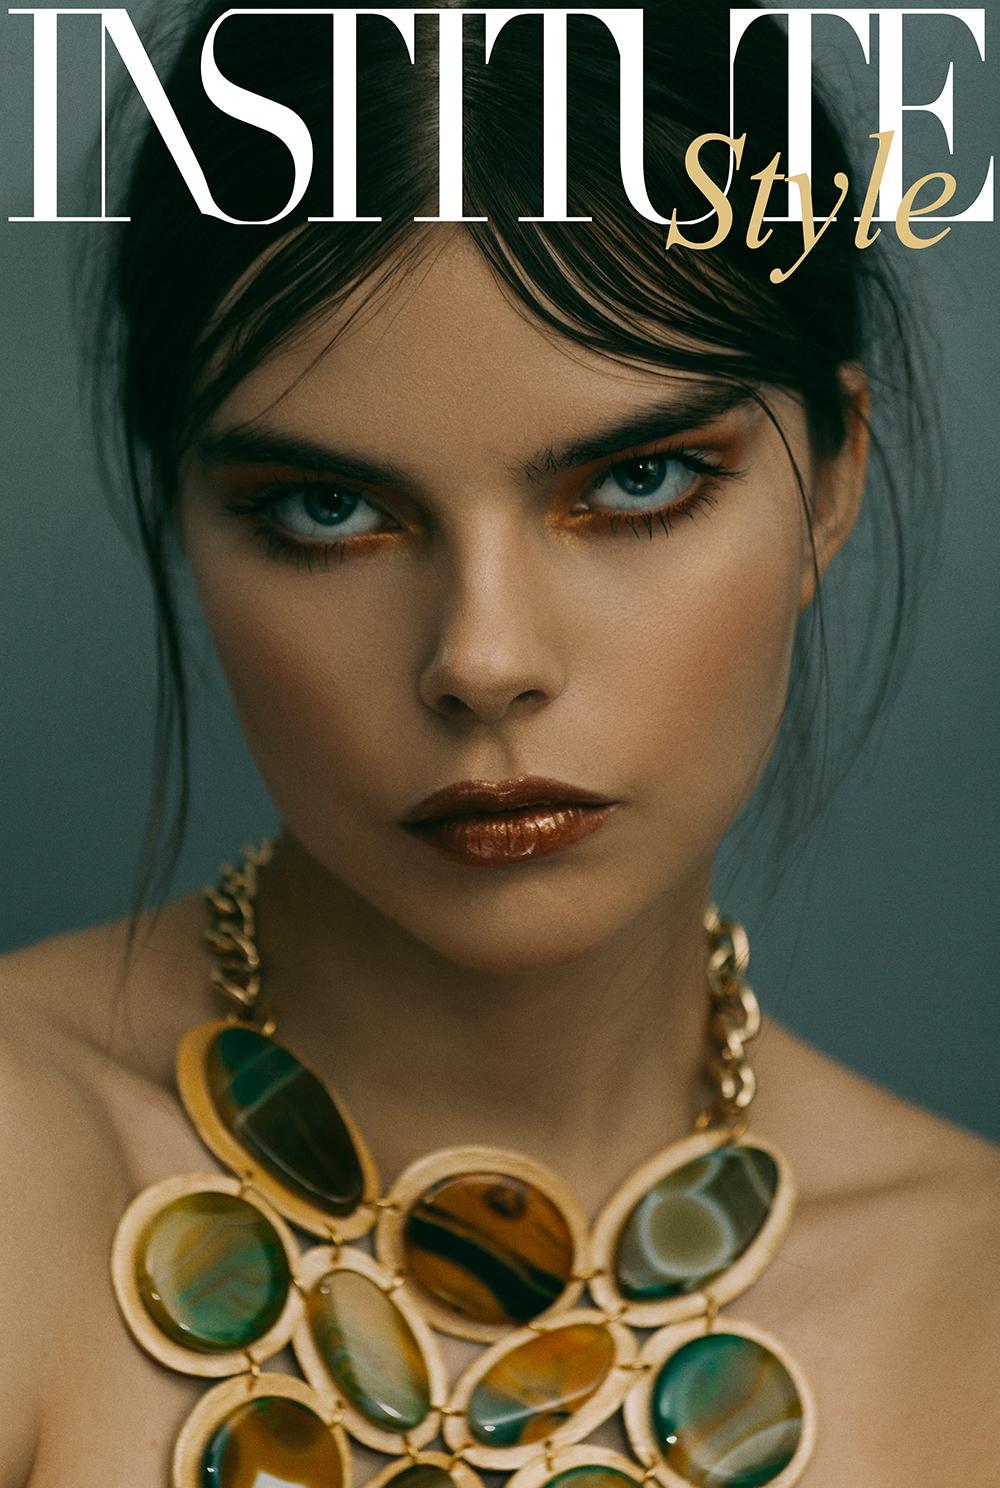 Images Alina Aliluykina nude photos 2019